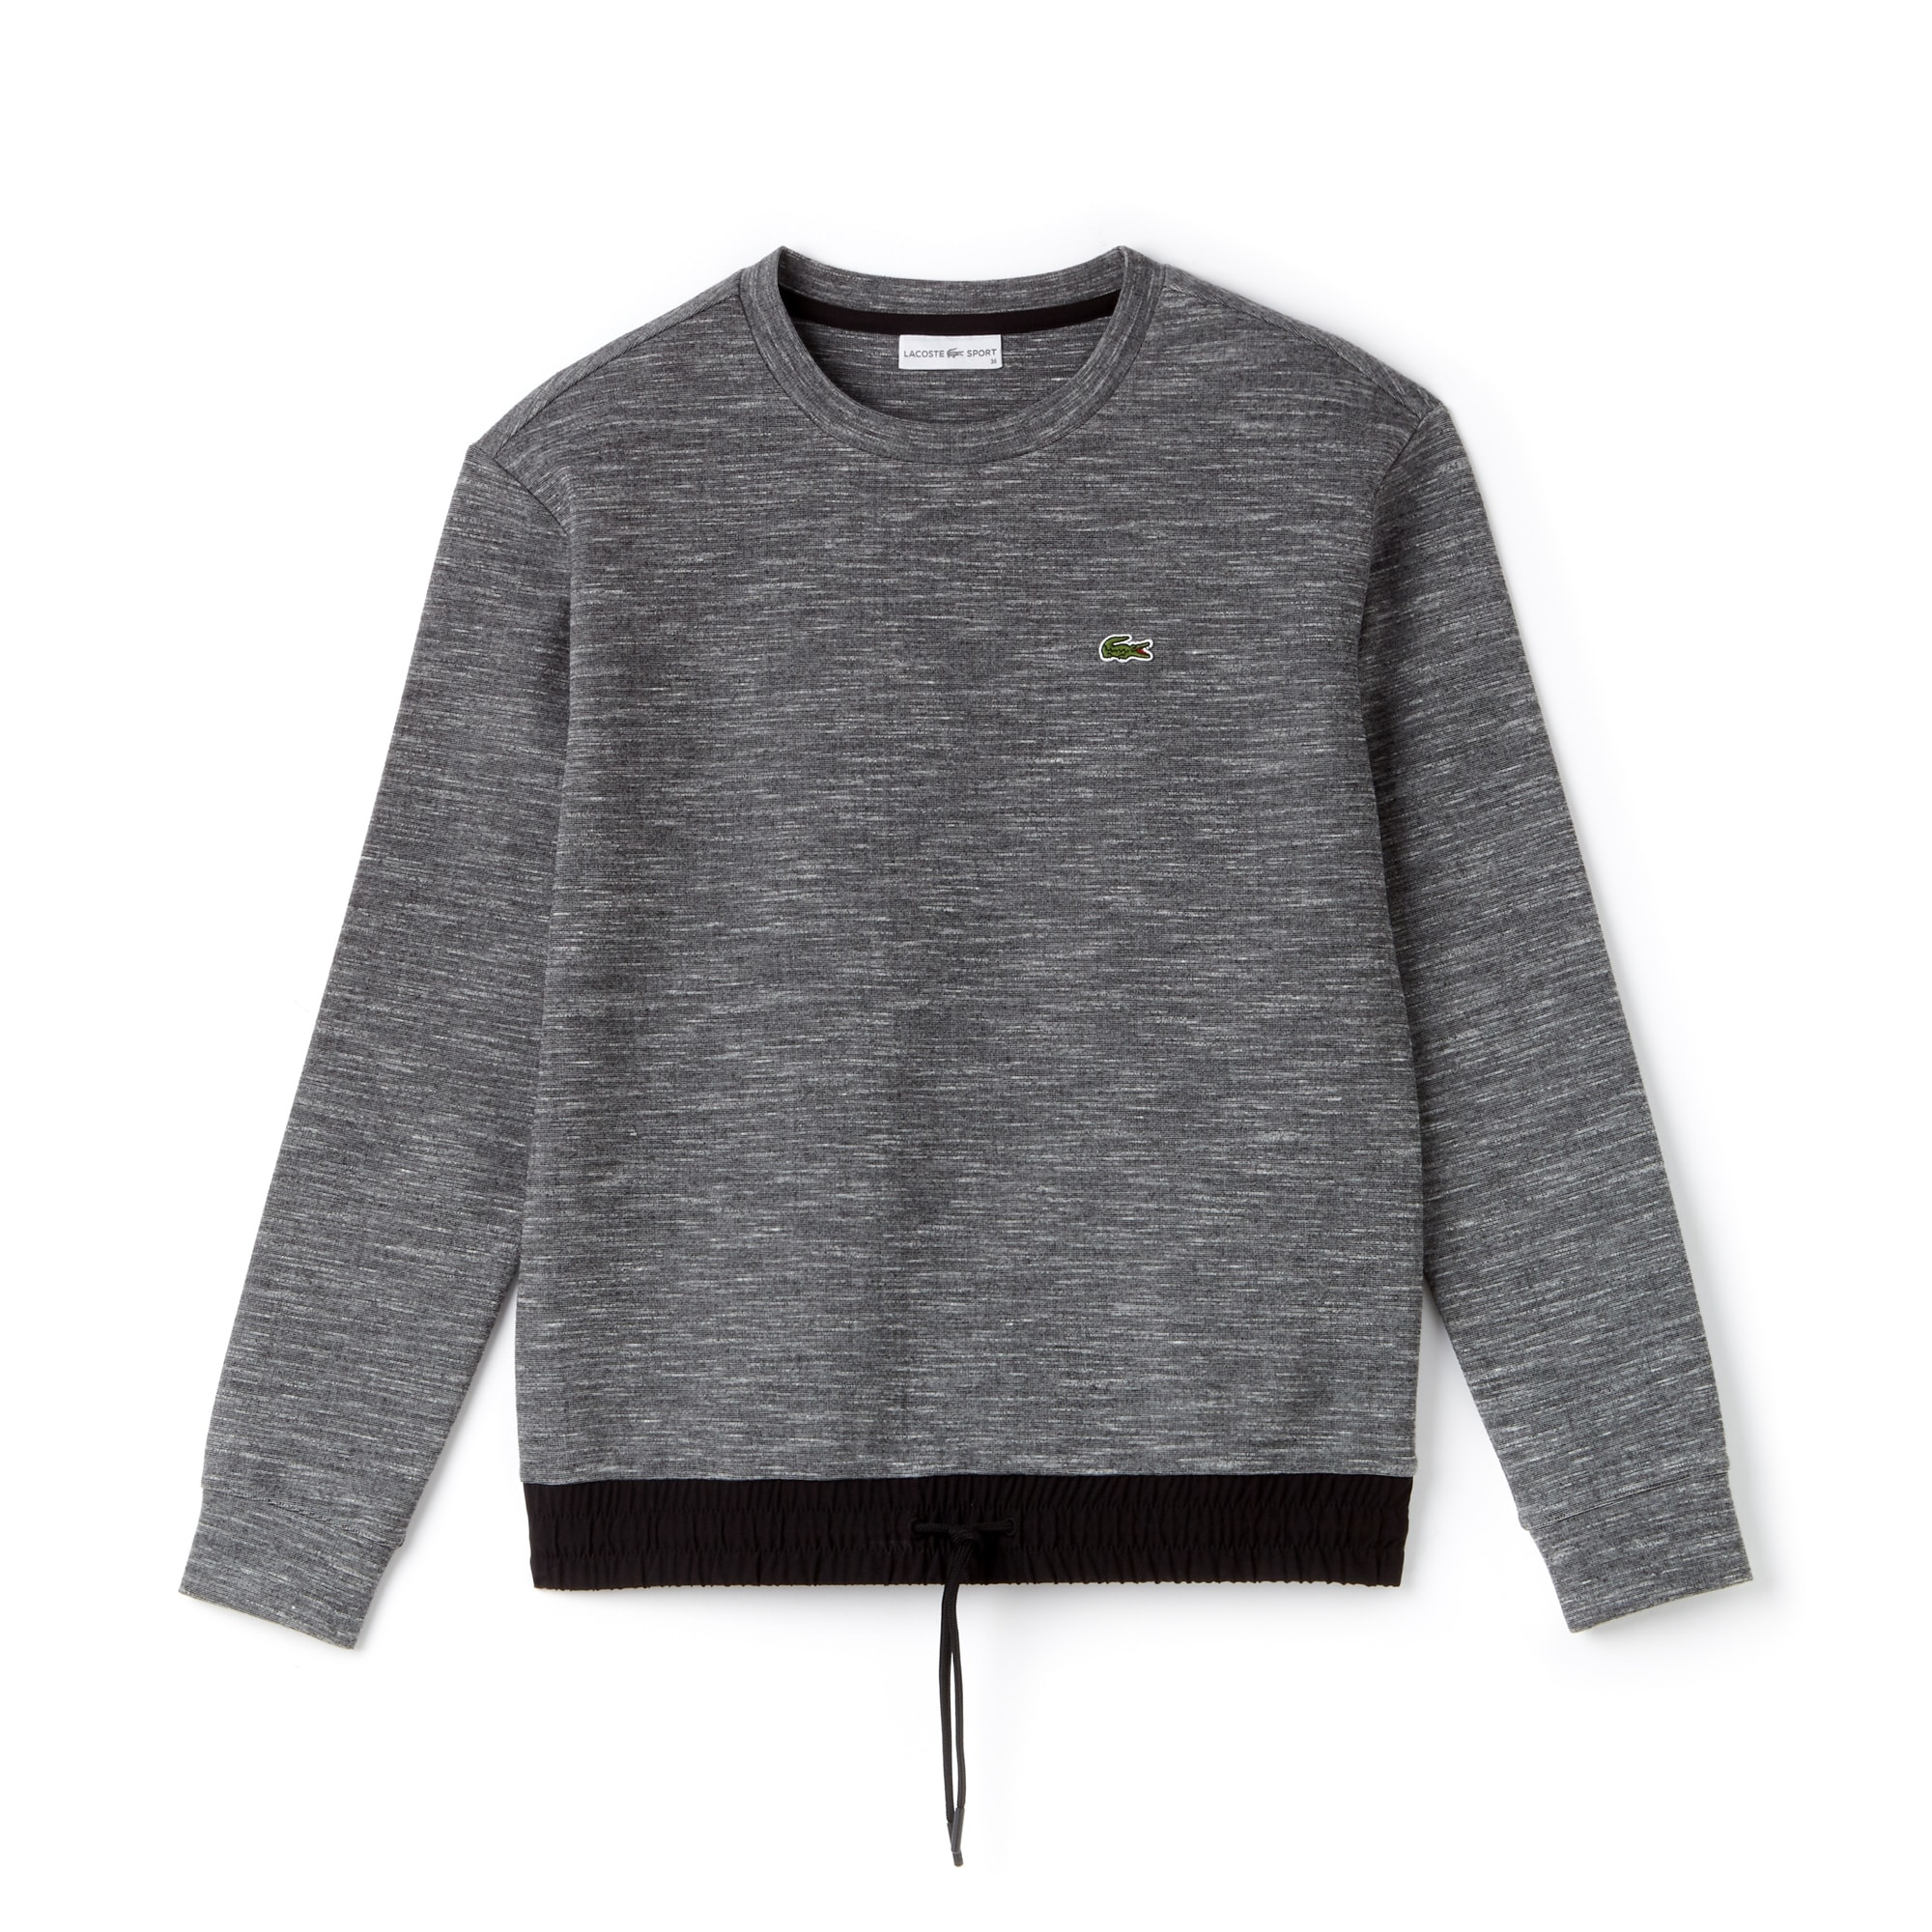 Lacoste SPORT女士科技羊毛和塔夫绸网球运动衫